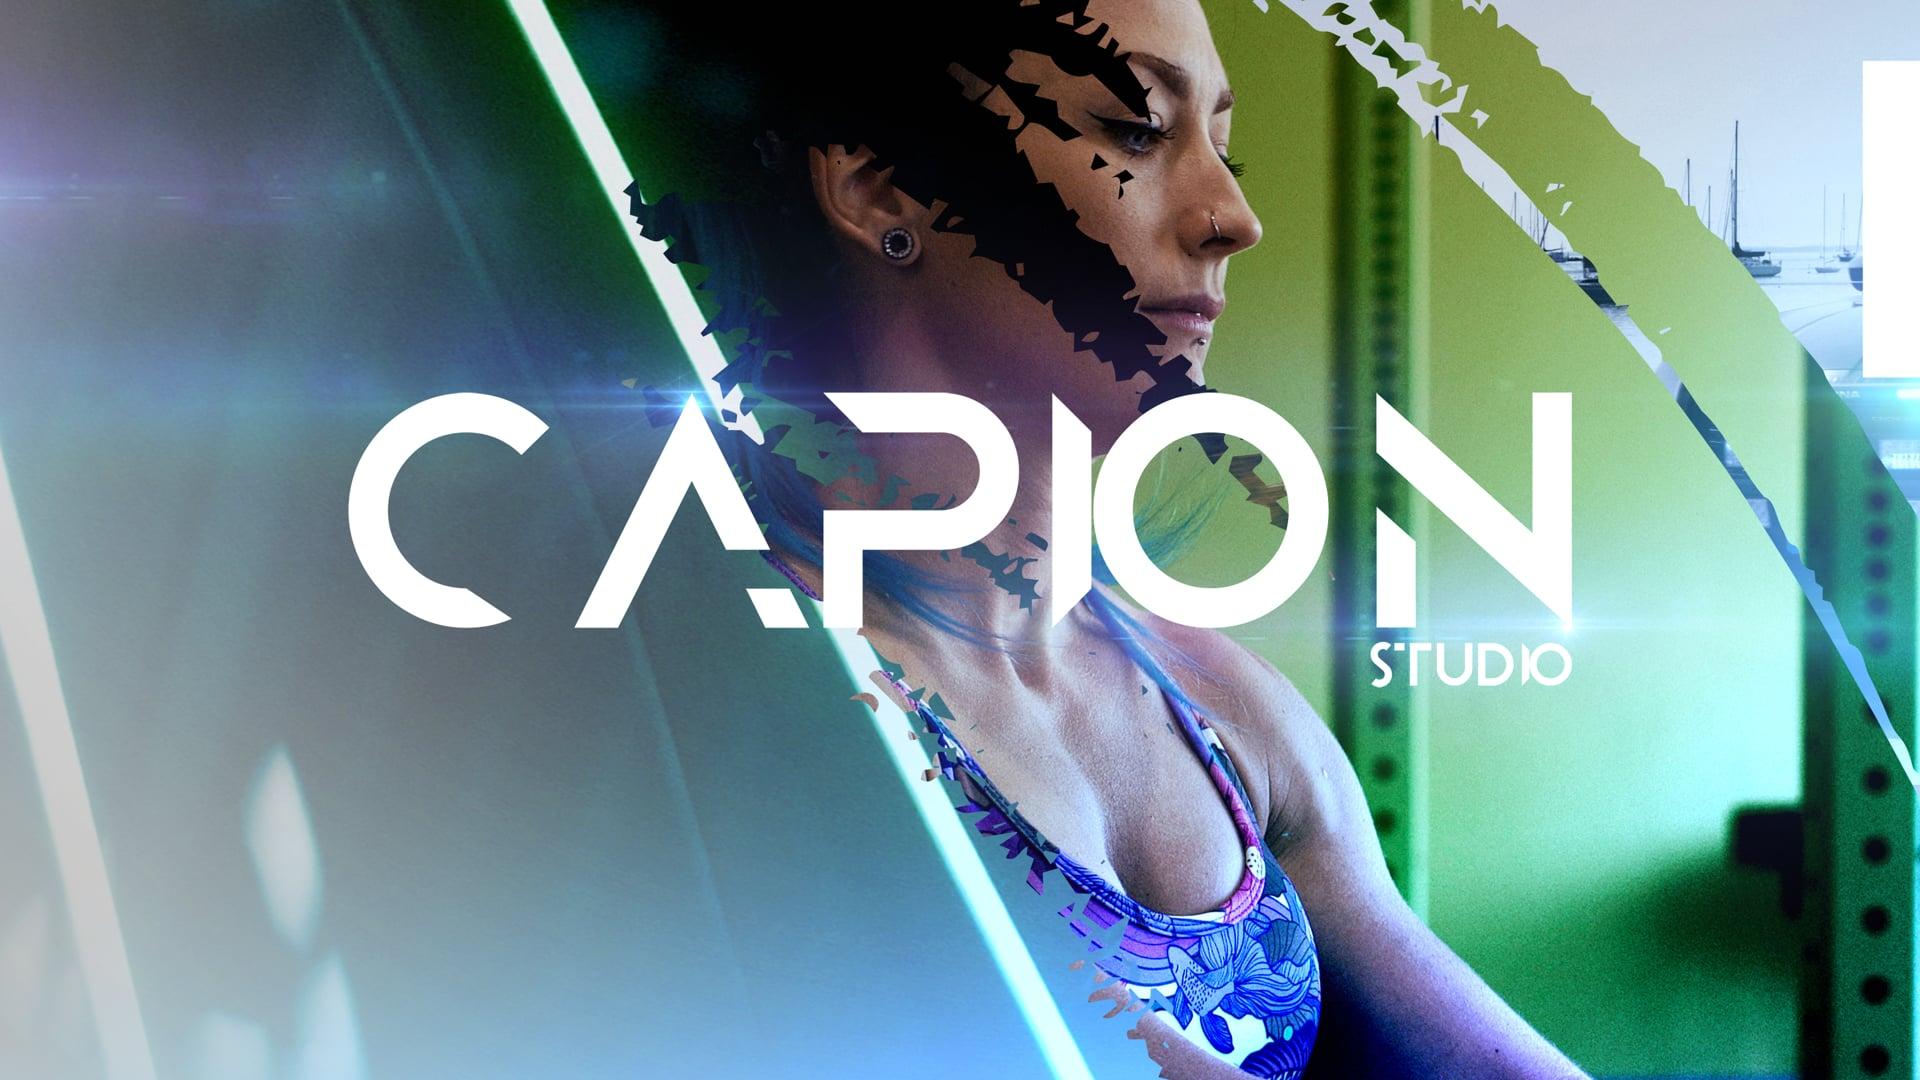 Capion Studio | Show Reel 2019